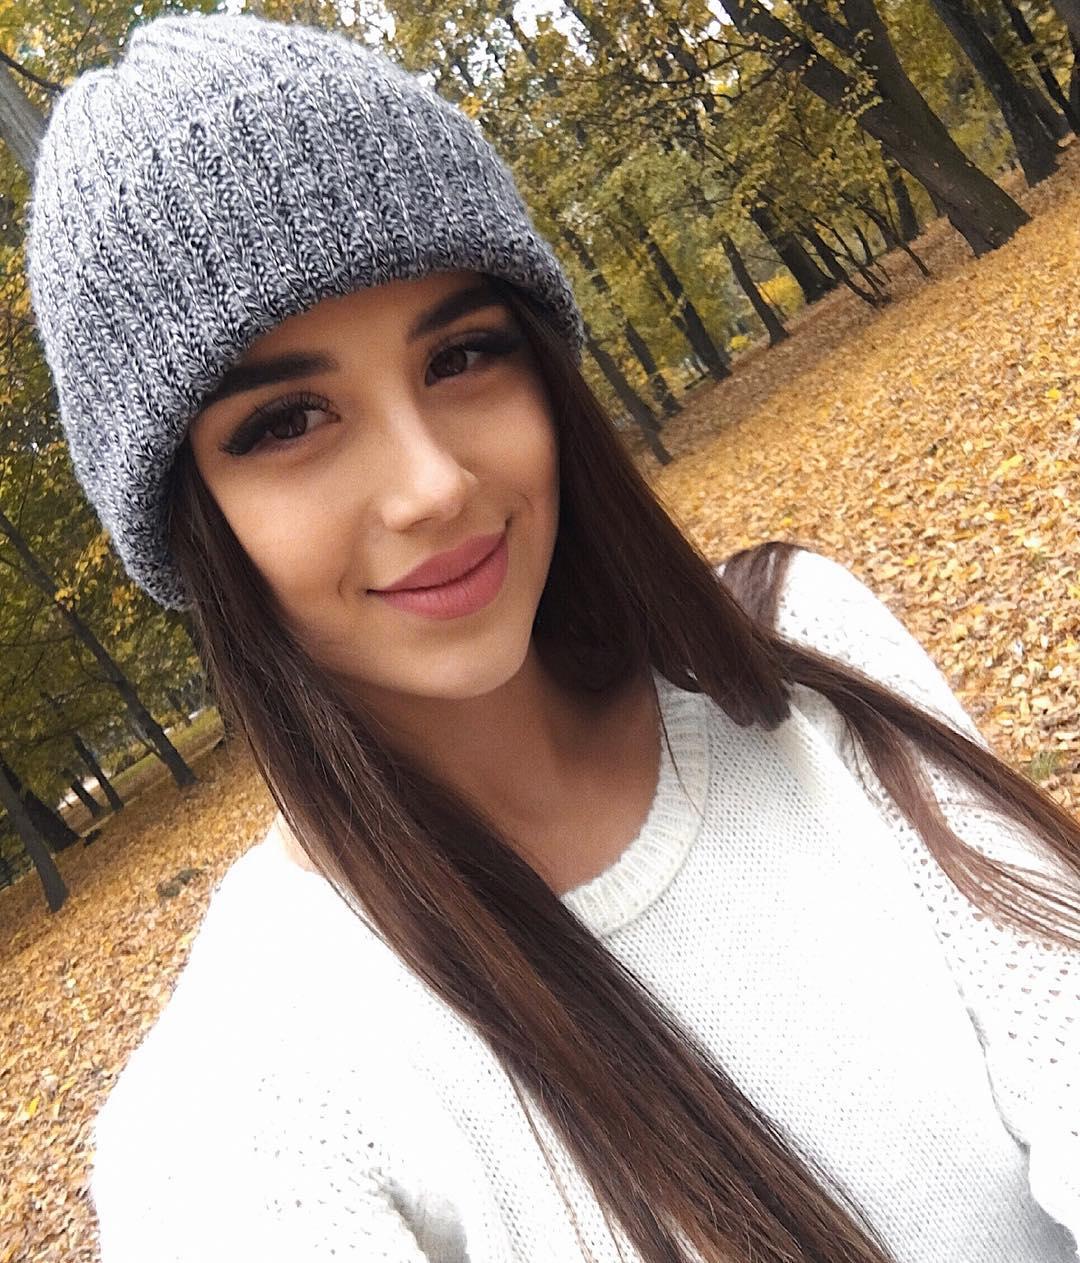 Olesia-Shevchuk-Wallpapers-Insta-Fit-Bio-7